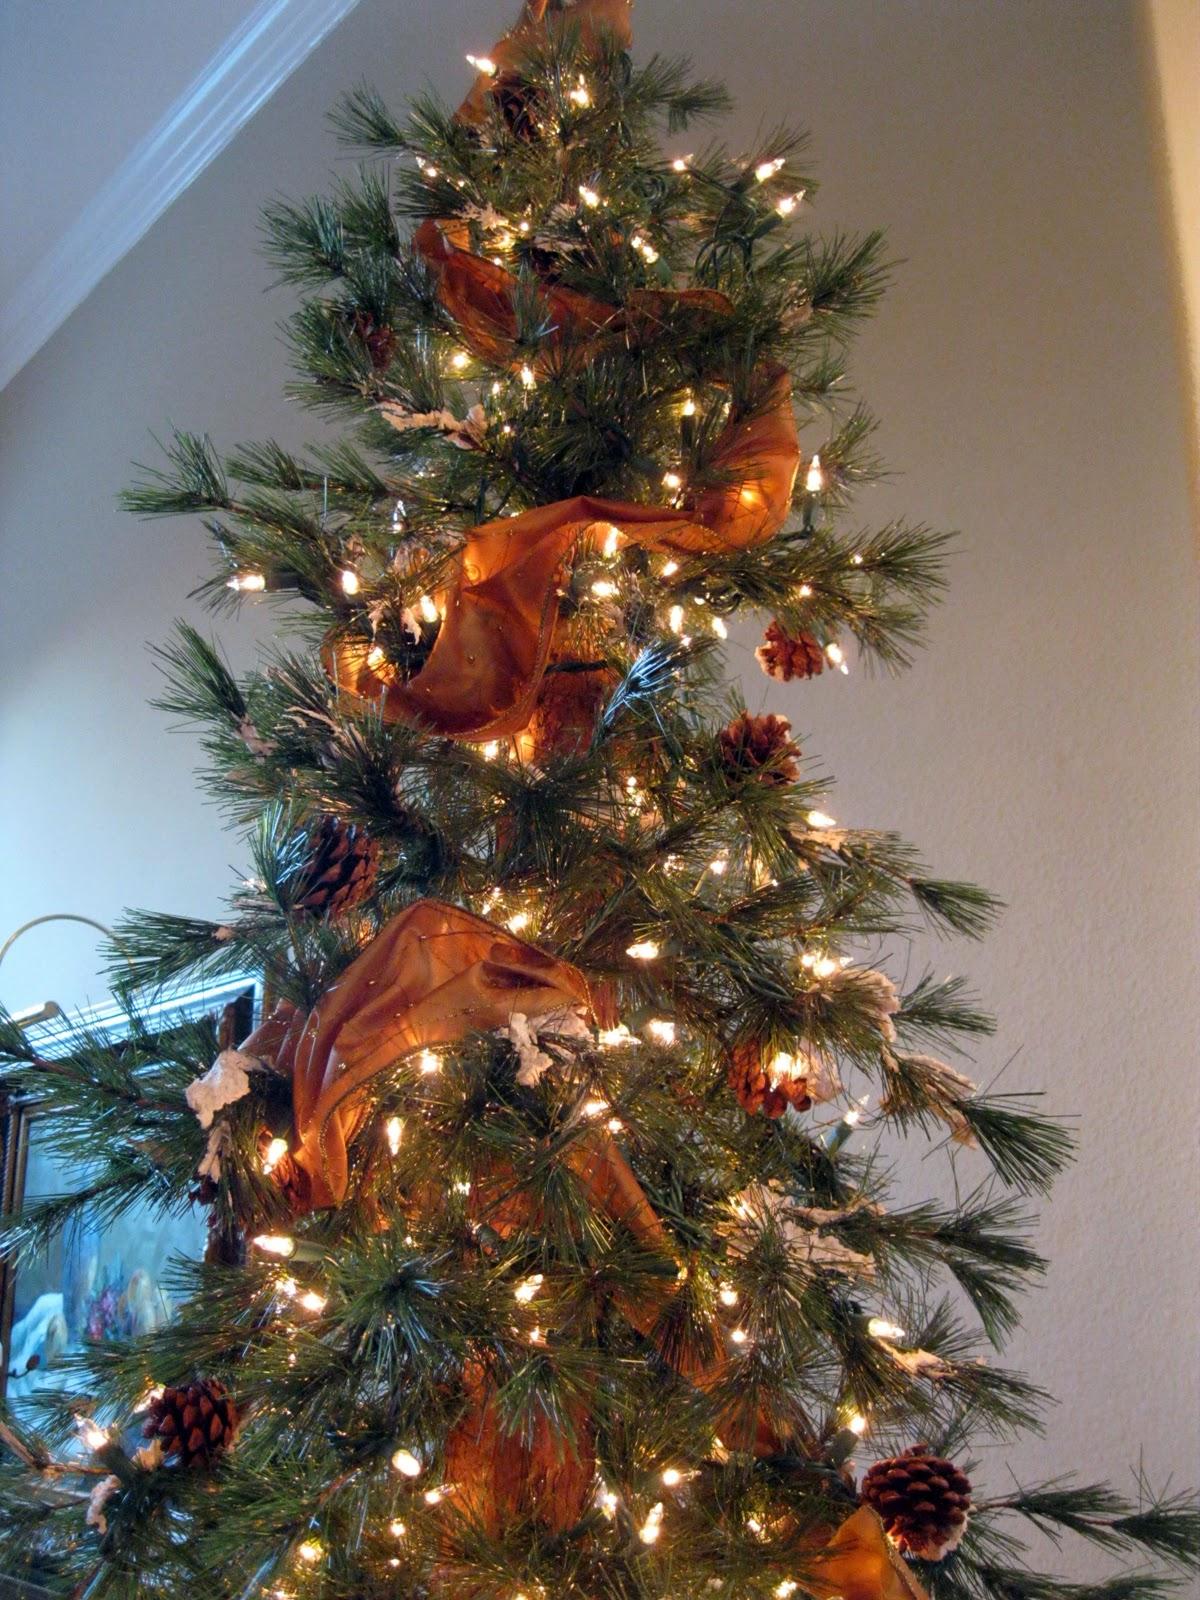 Decorating Christmas Tree With Ribbon Garland Photograph R